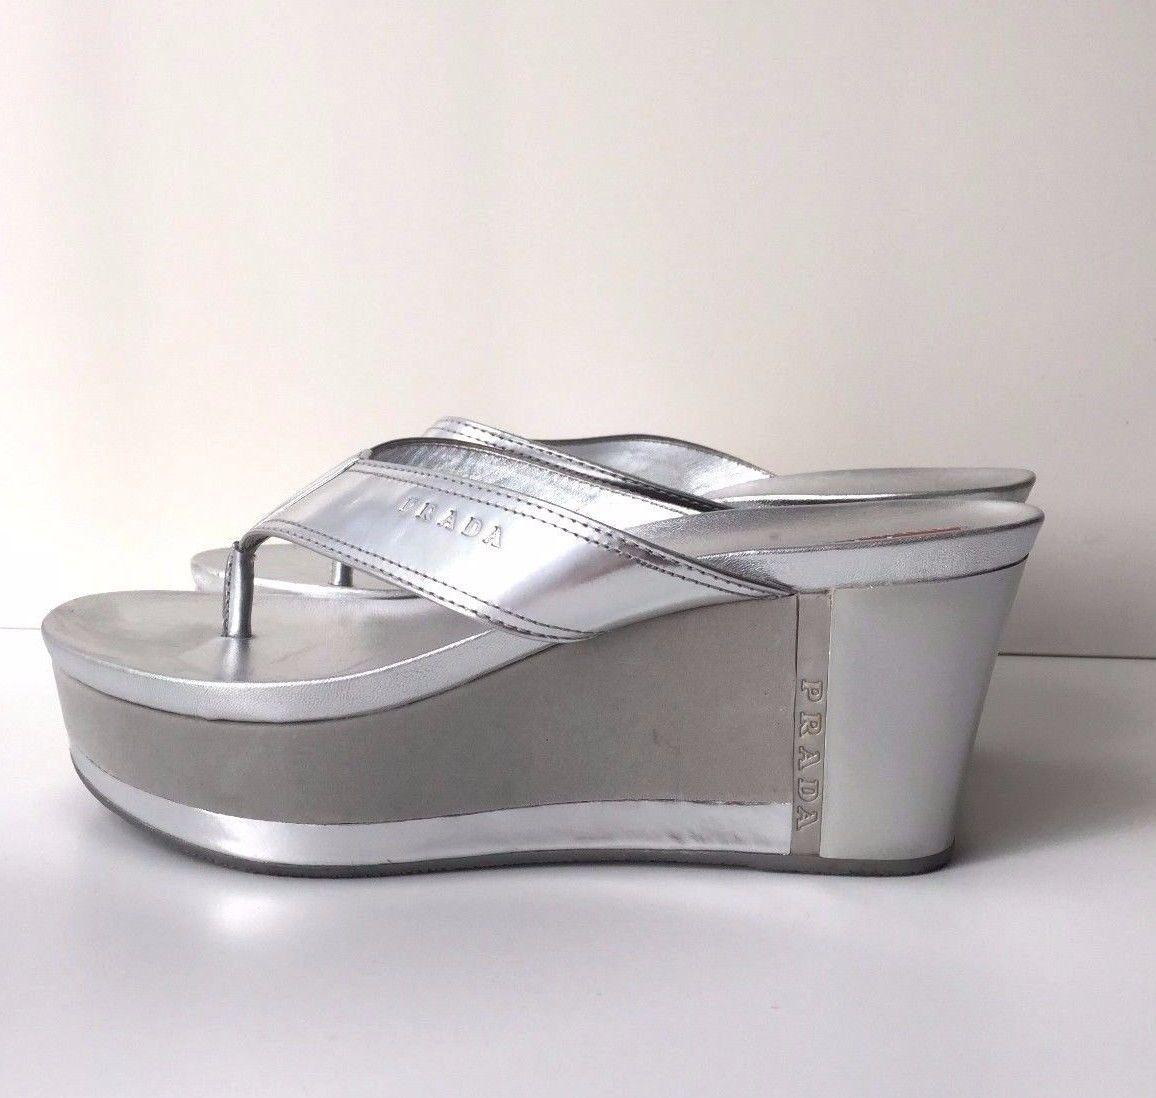 Prada Sport Silver Platform Sandals